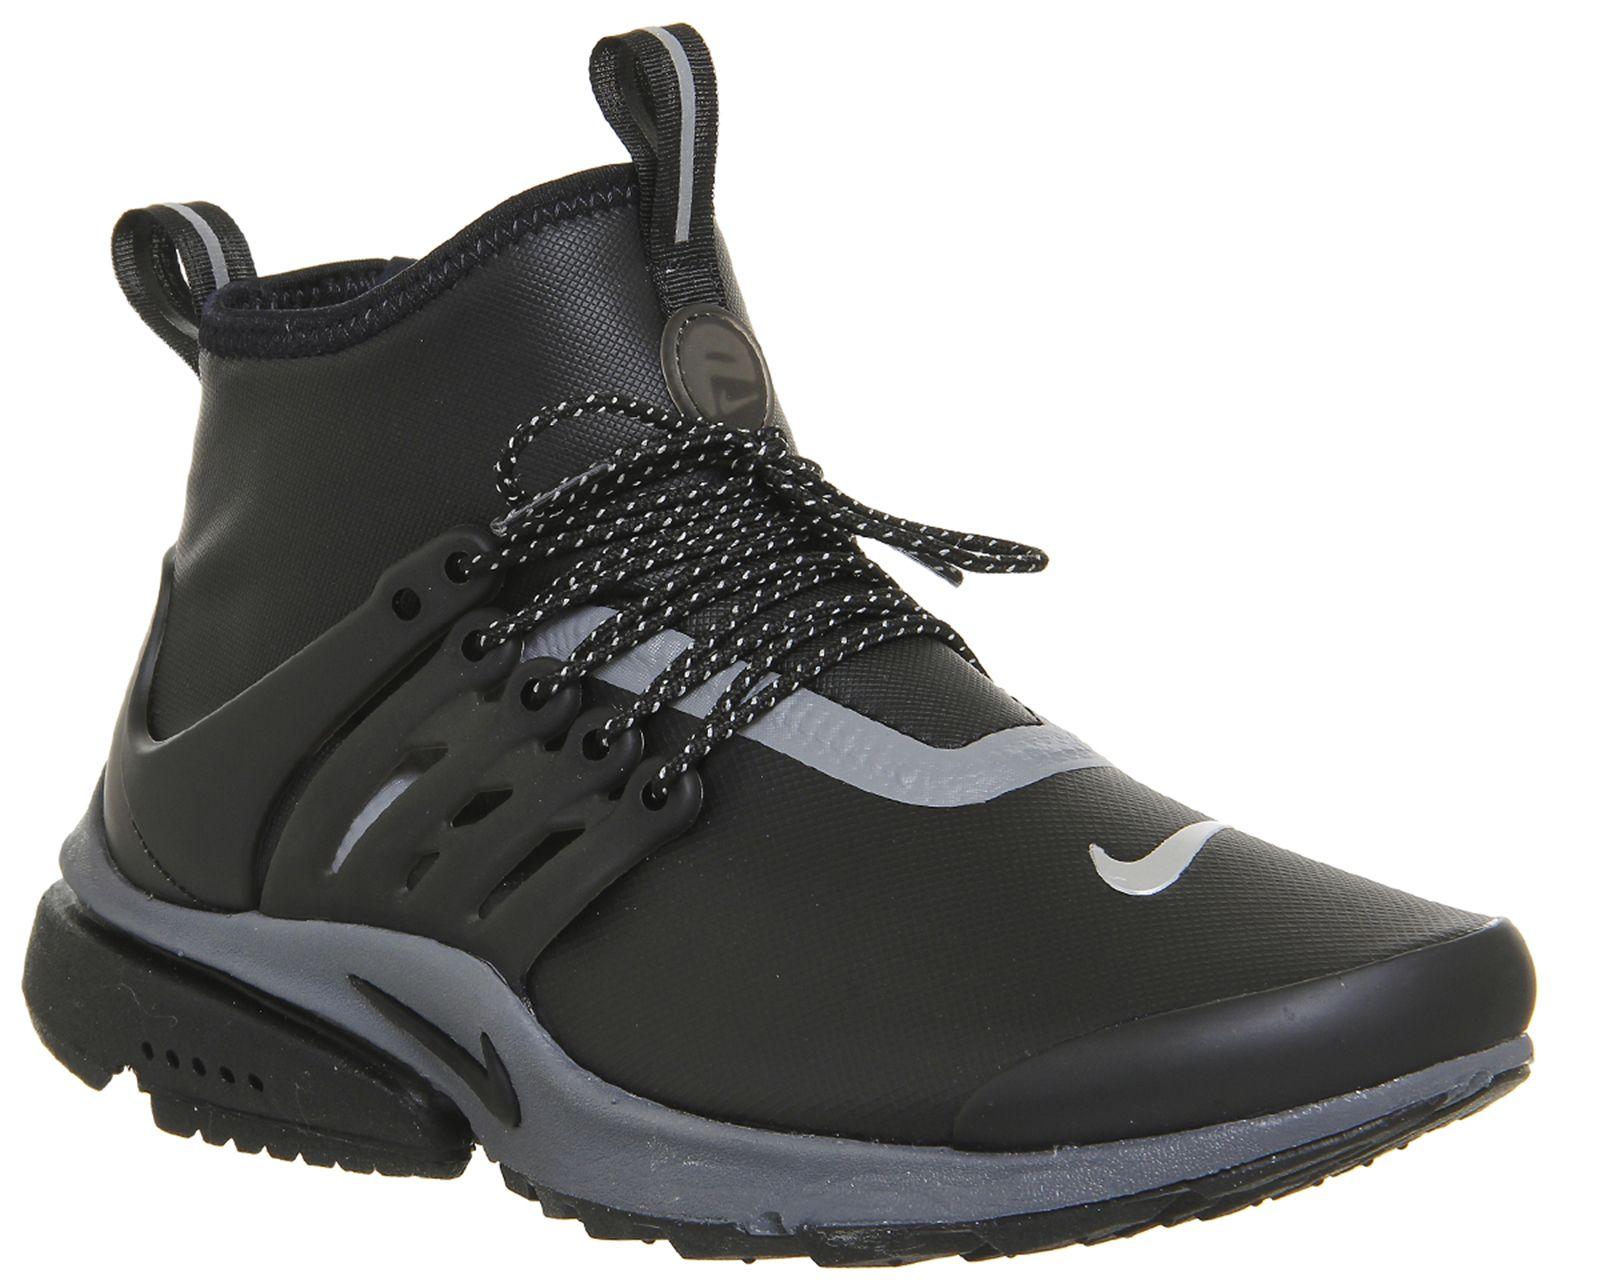 Nike Air Presto Mid Utility Black Black Reflect Silver Nike Air Presto Air Presto Boots